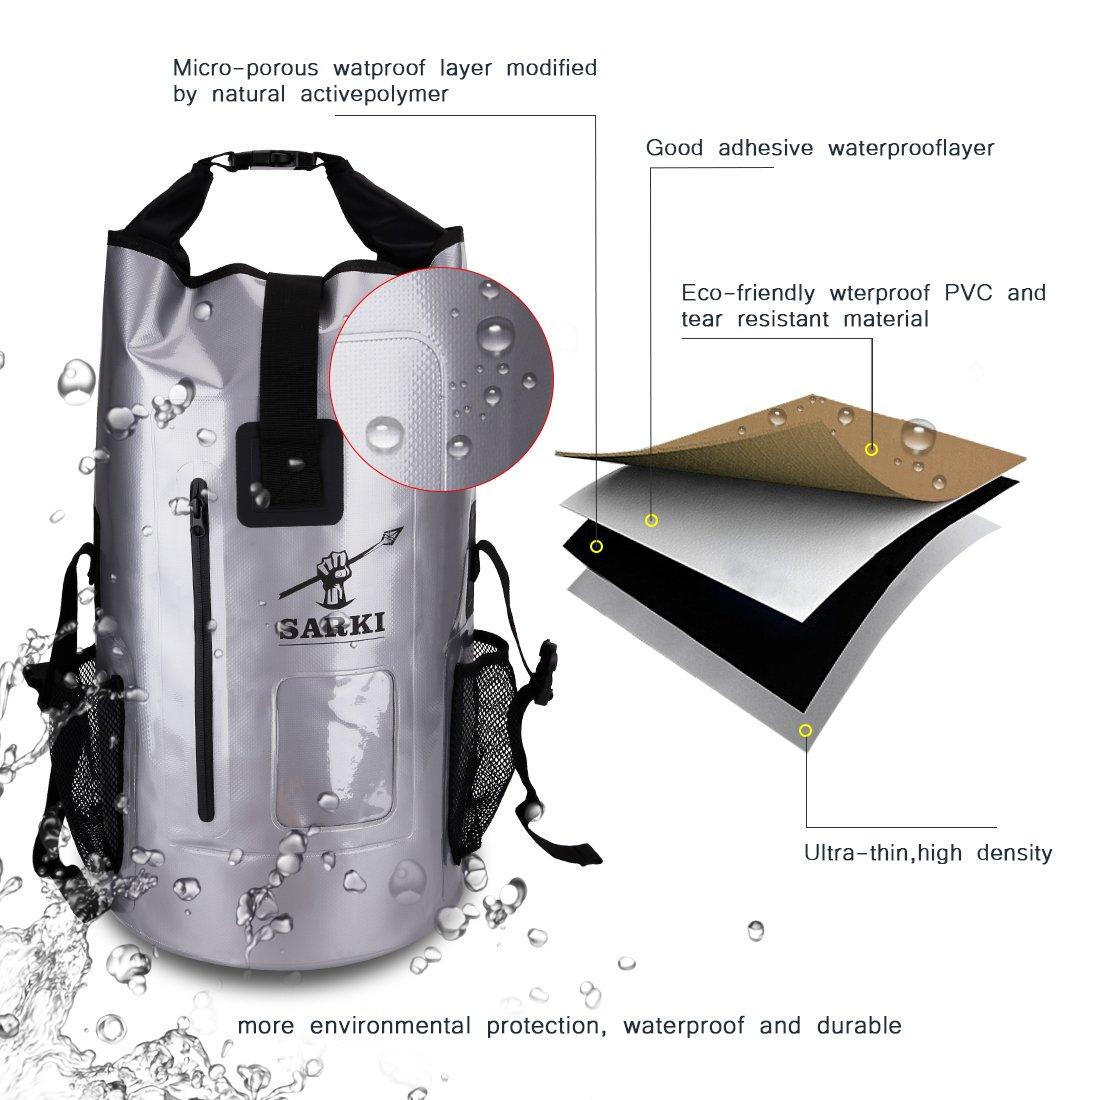 SARKI 30L Waterproof Backpack-Dry Bag with Zipper Pocket and Padded  Shoulder Straps - Large Dry Sack for Kayaking c343a0050a01c